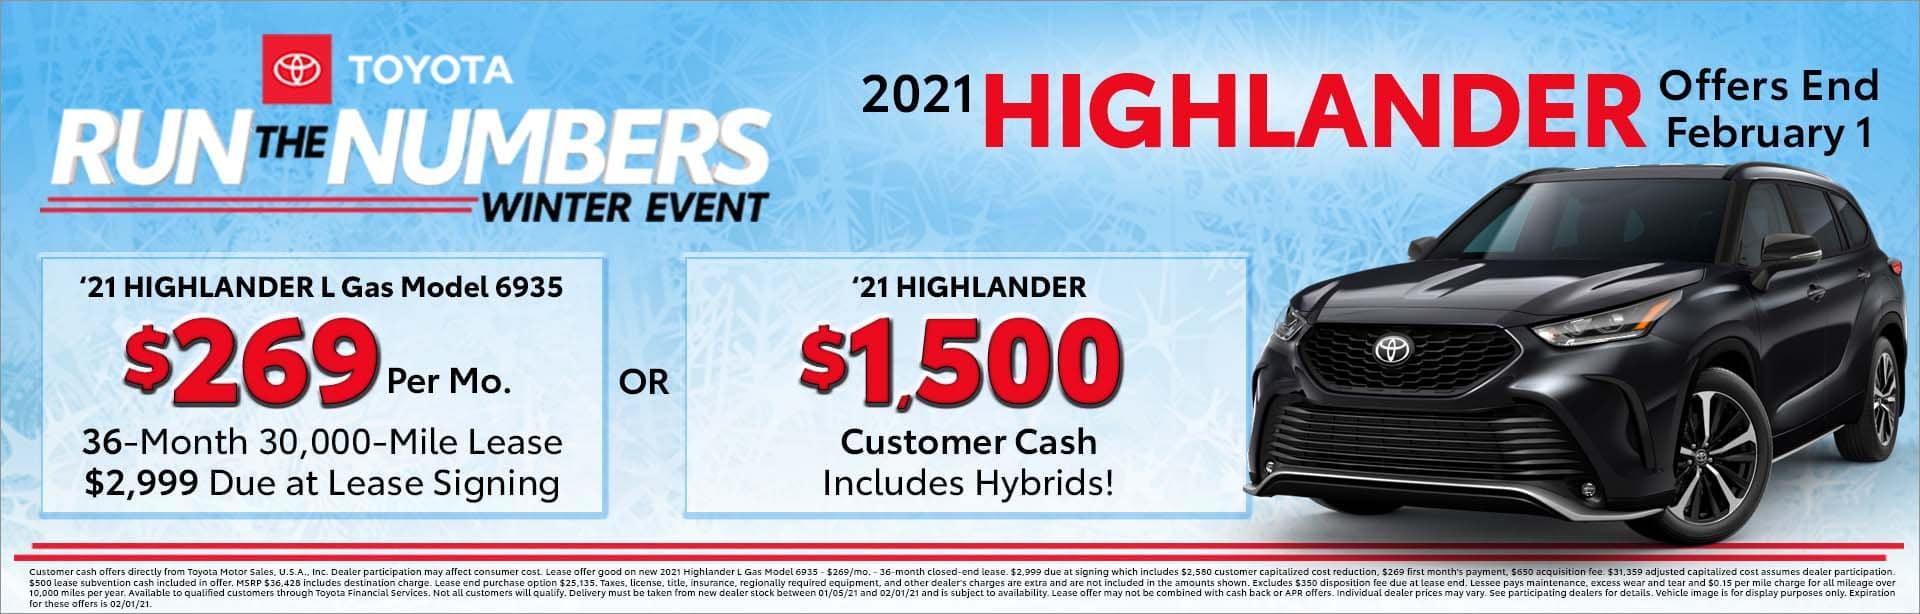 toyota highlander offers 2021